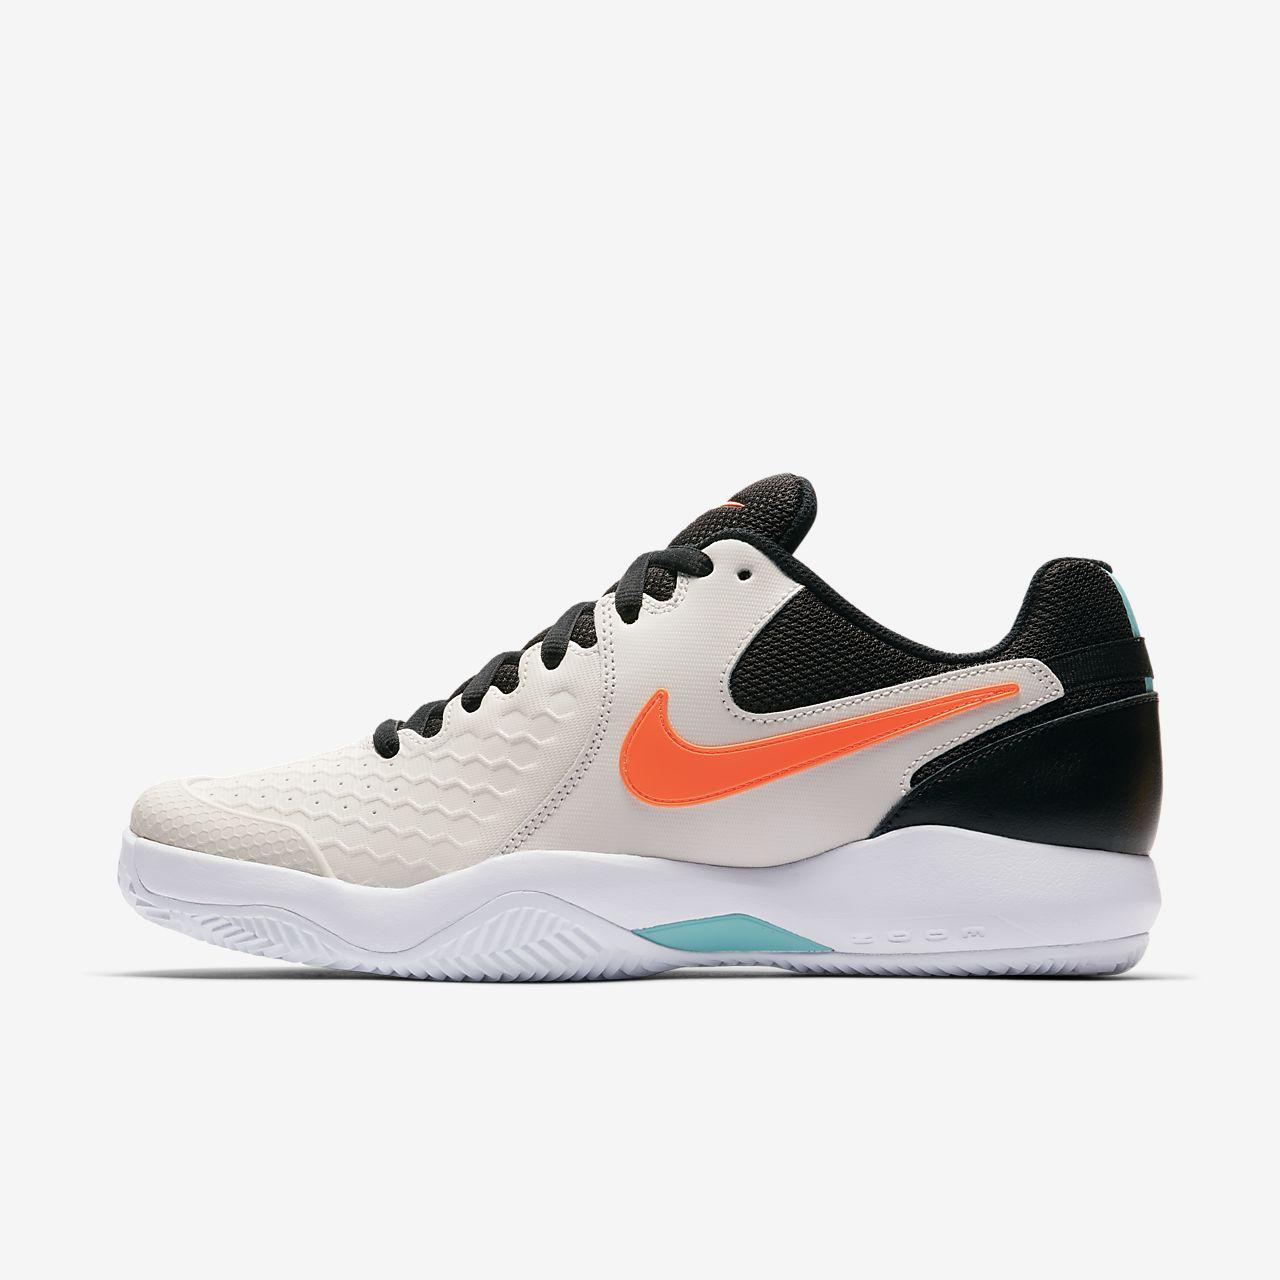 online store 5c3ac 88dde NikeNIKE AIR ZOOM RESISTANCE CLY TennisschuheHerren PHANTOM HYPER  CRIMSONBLEACHED AQUABLACKWHITE. Herren Nike ...